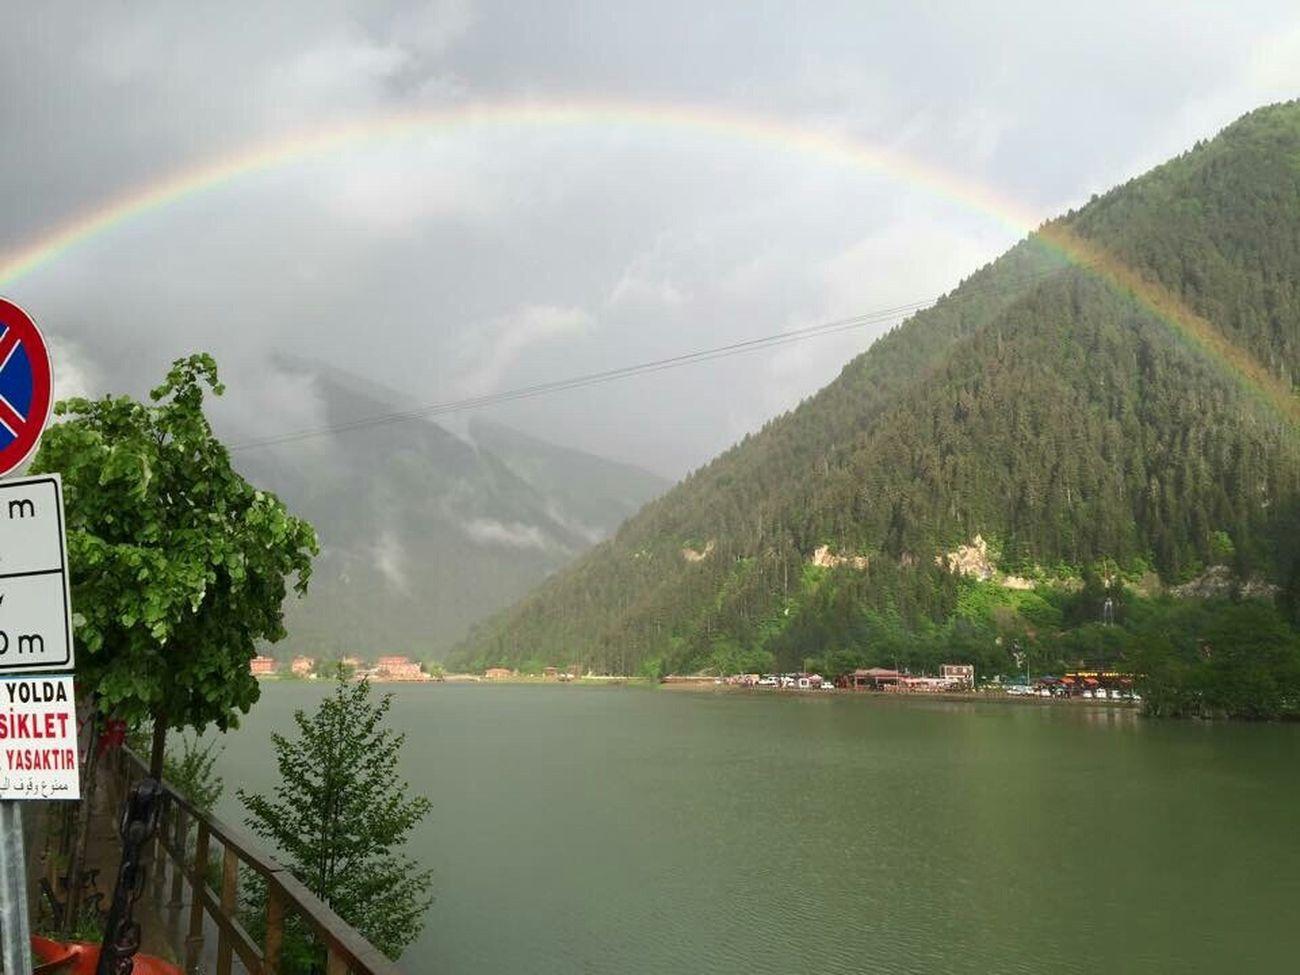 Trabzon Turkey  Trabzon Uzungol Turkey Çaykara Nature Greens Lake Rainbow Gokkusagi Turkey ♡